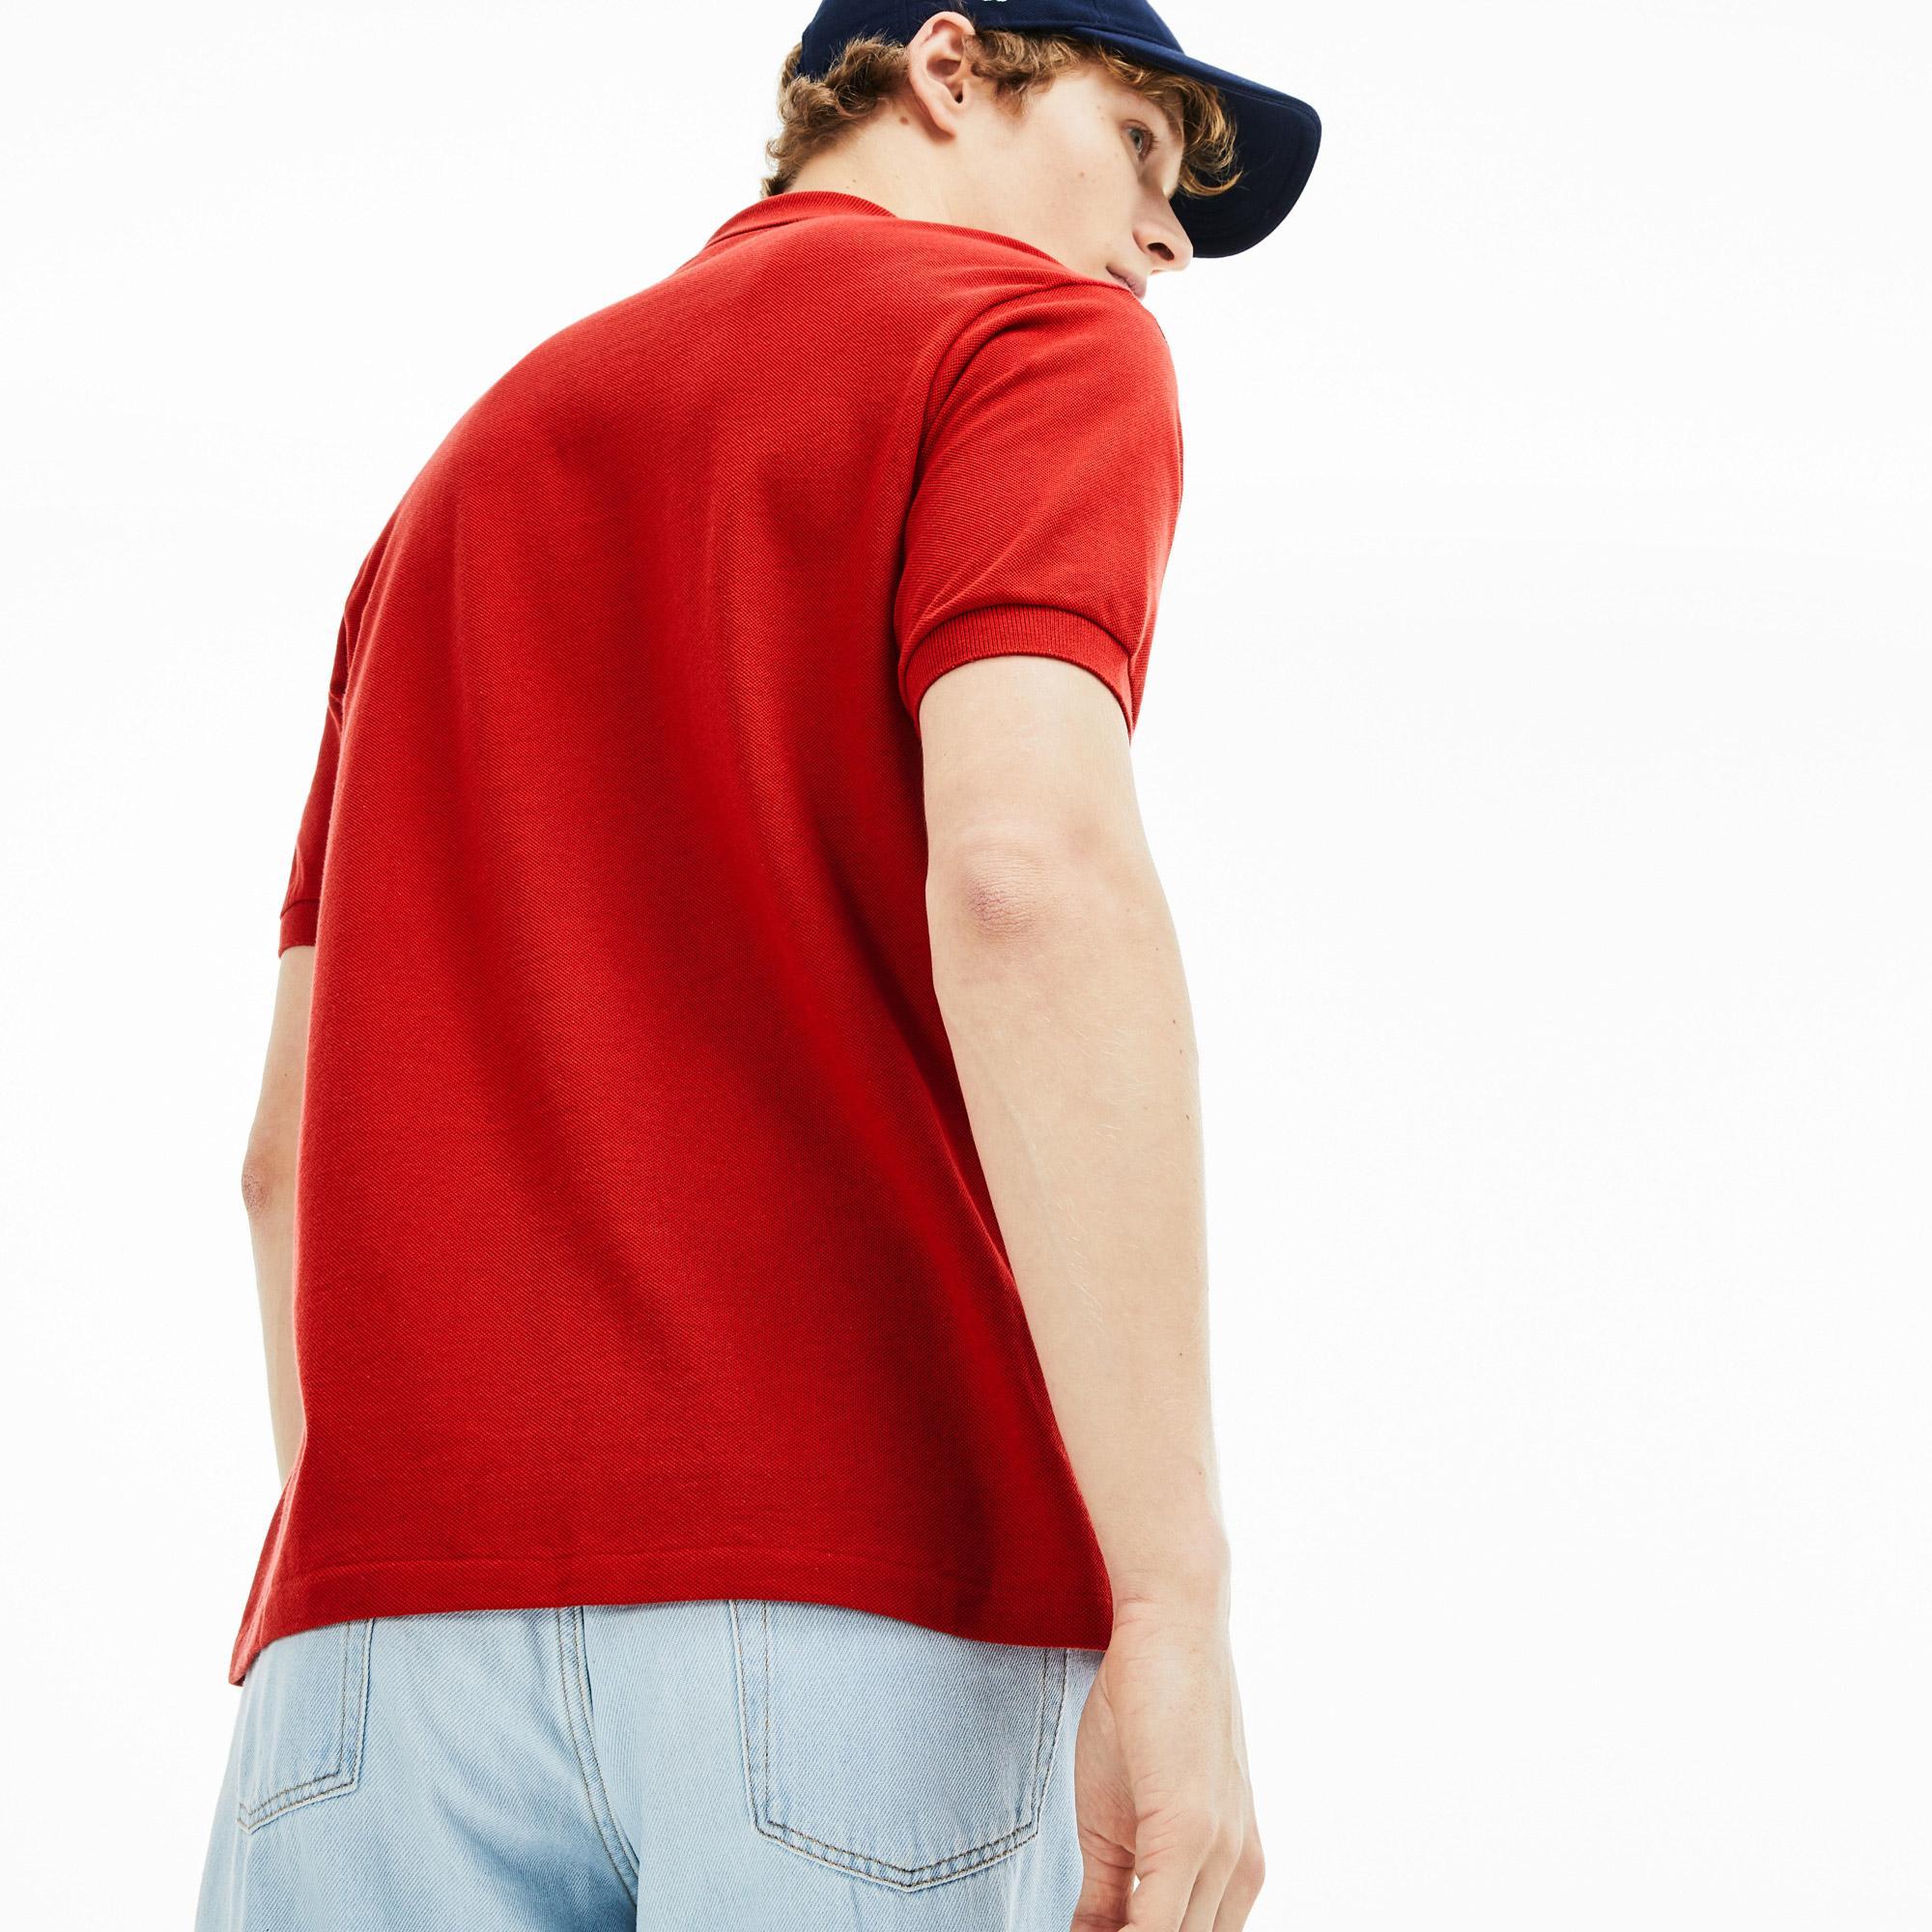 Lacoste Erkek L1212 Kırmızı Polo